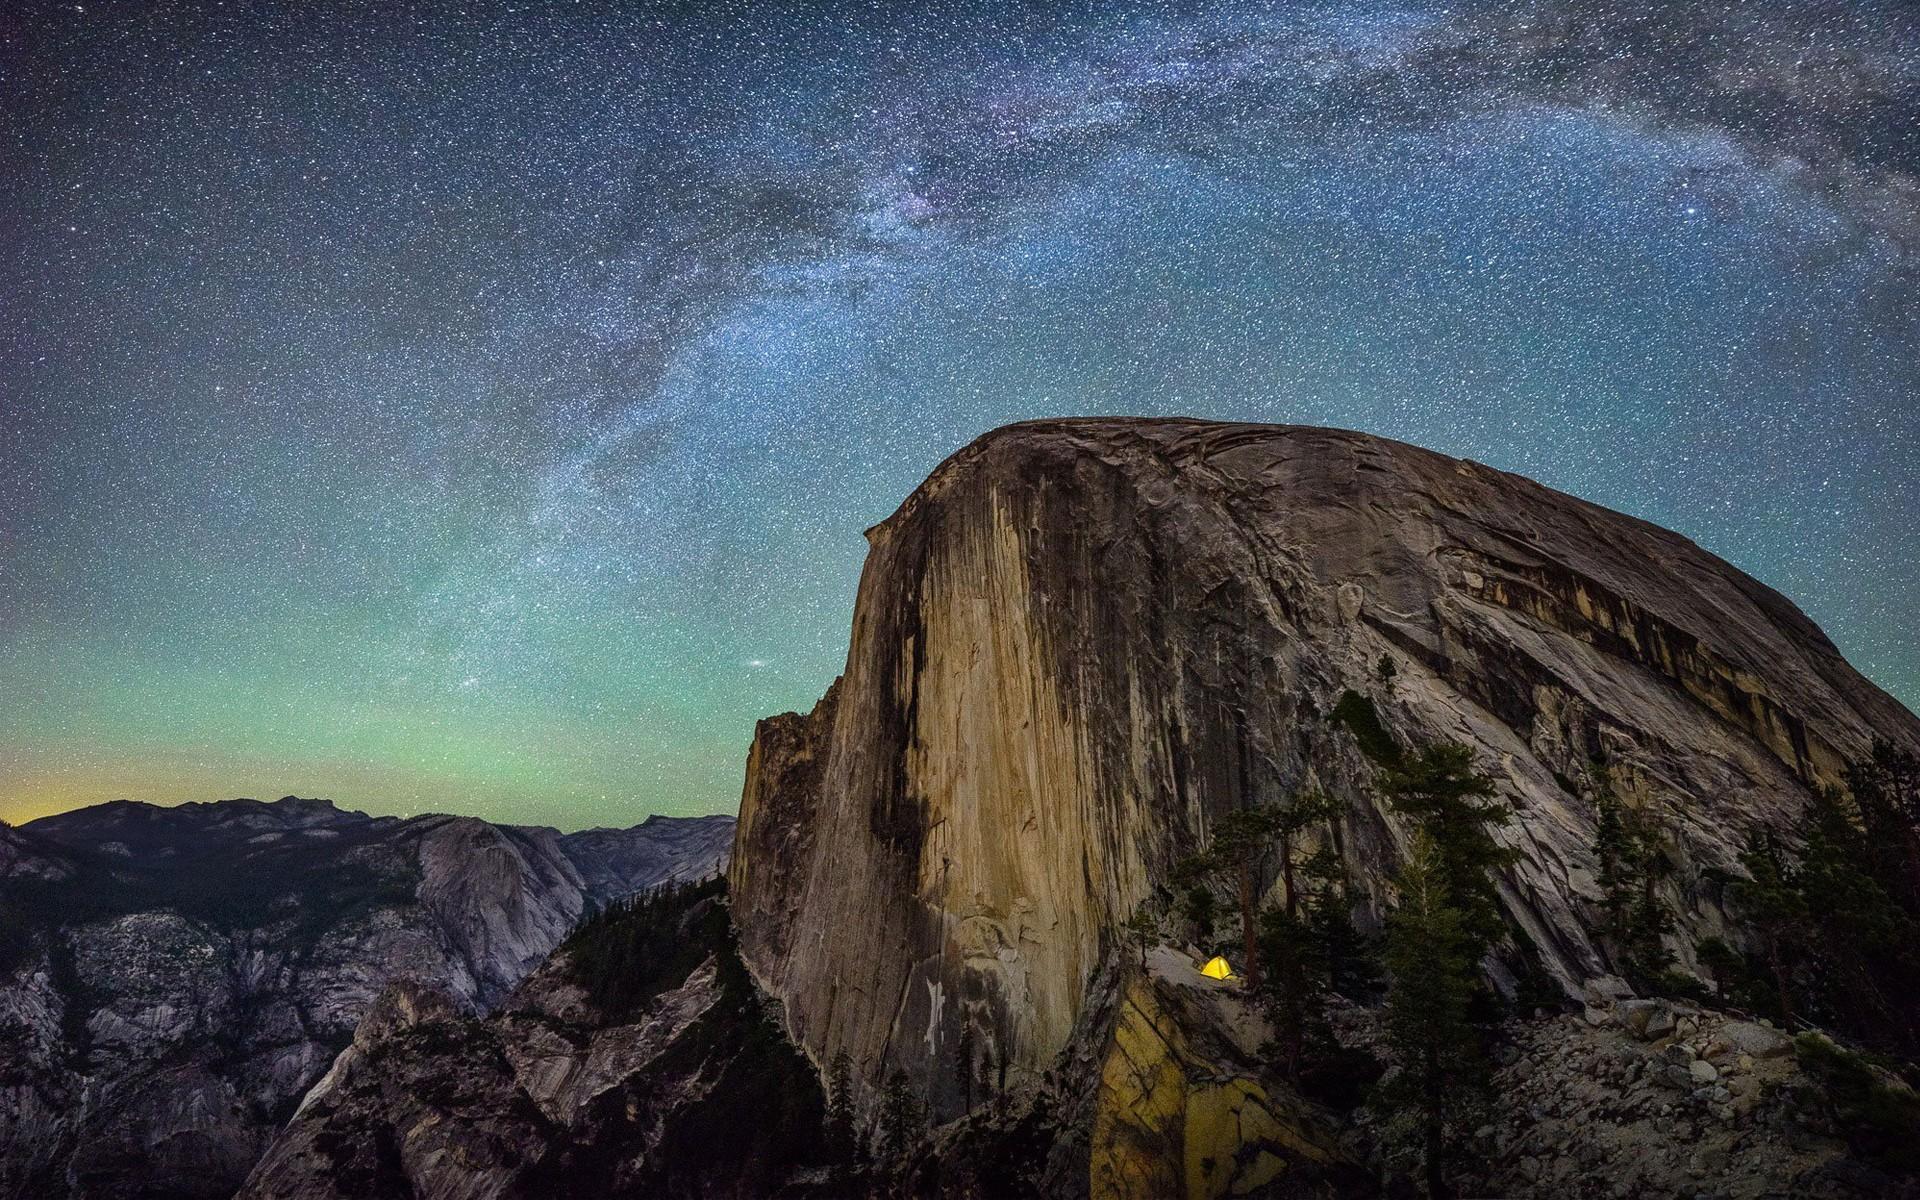 download Yosemite Camp 1080p Wallpaper New HD Wallpapers 1920x1200